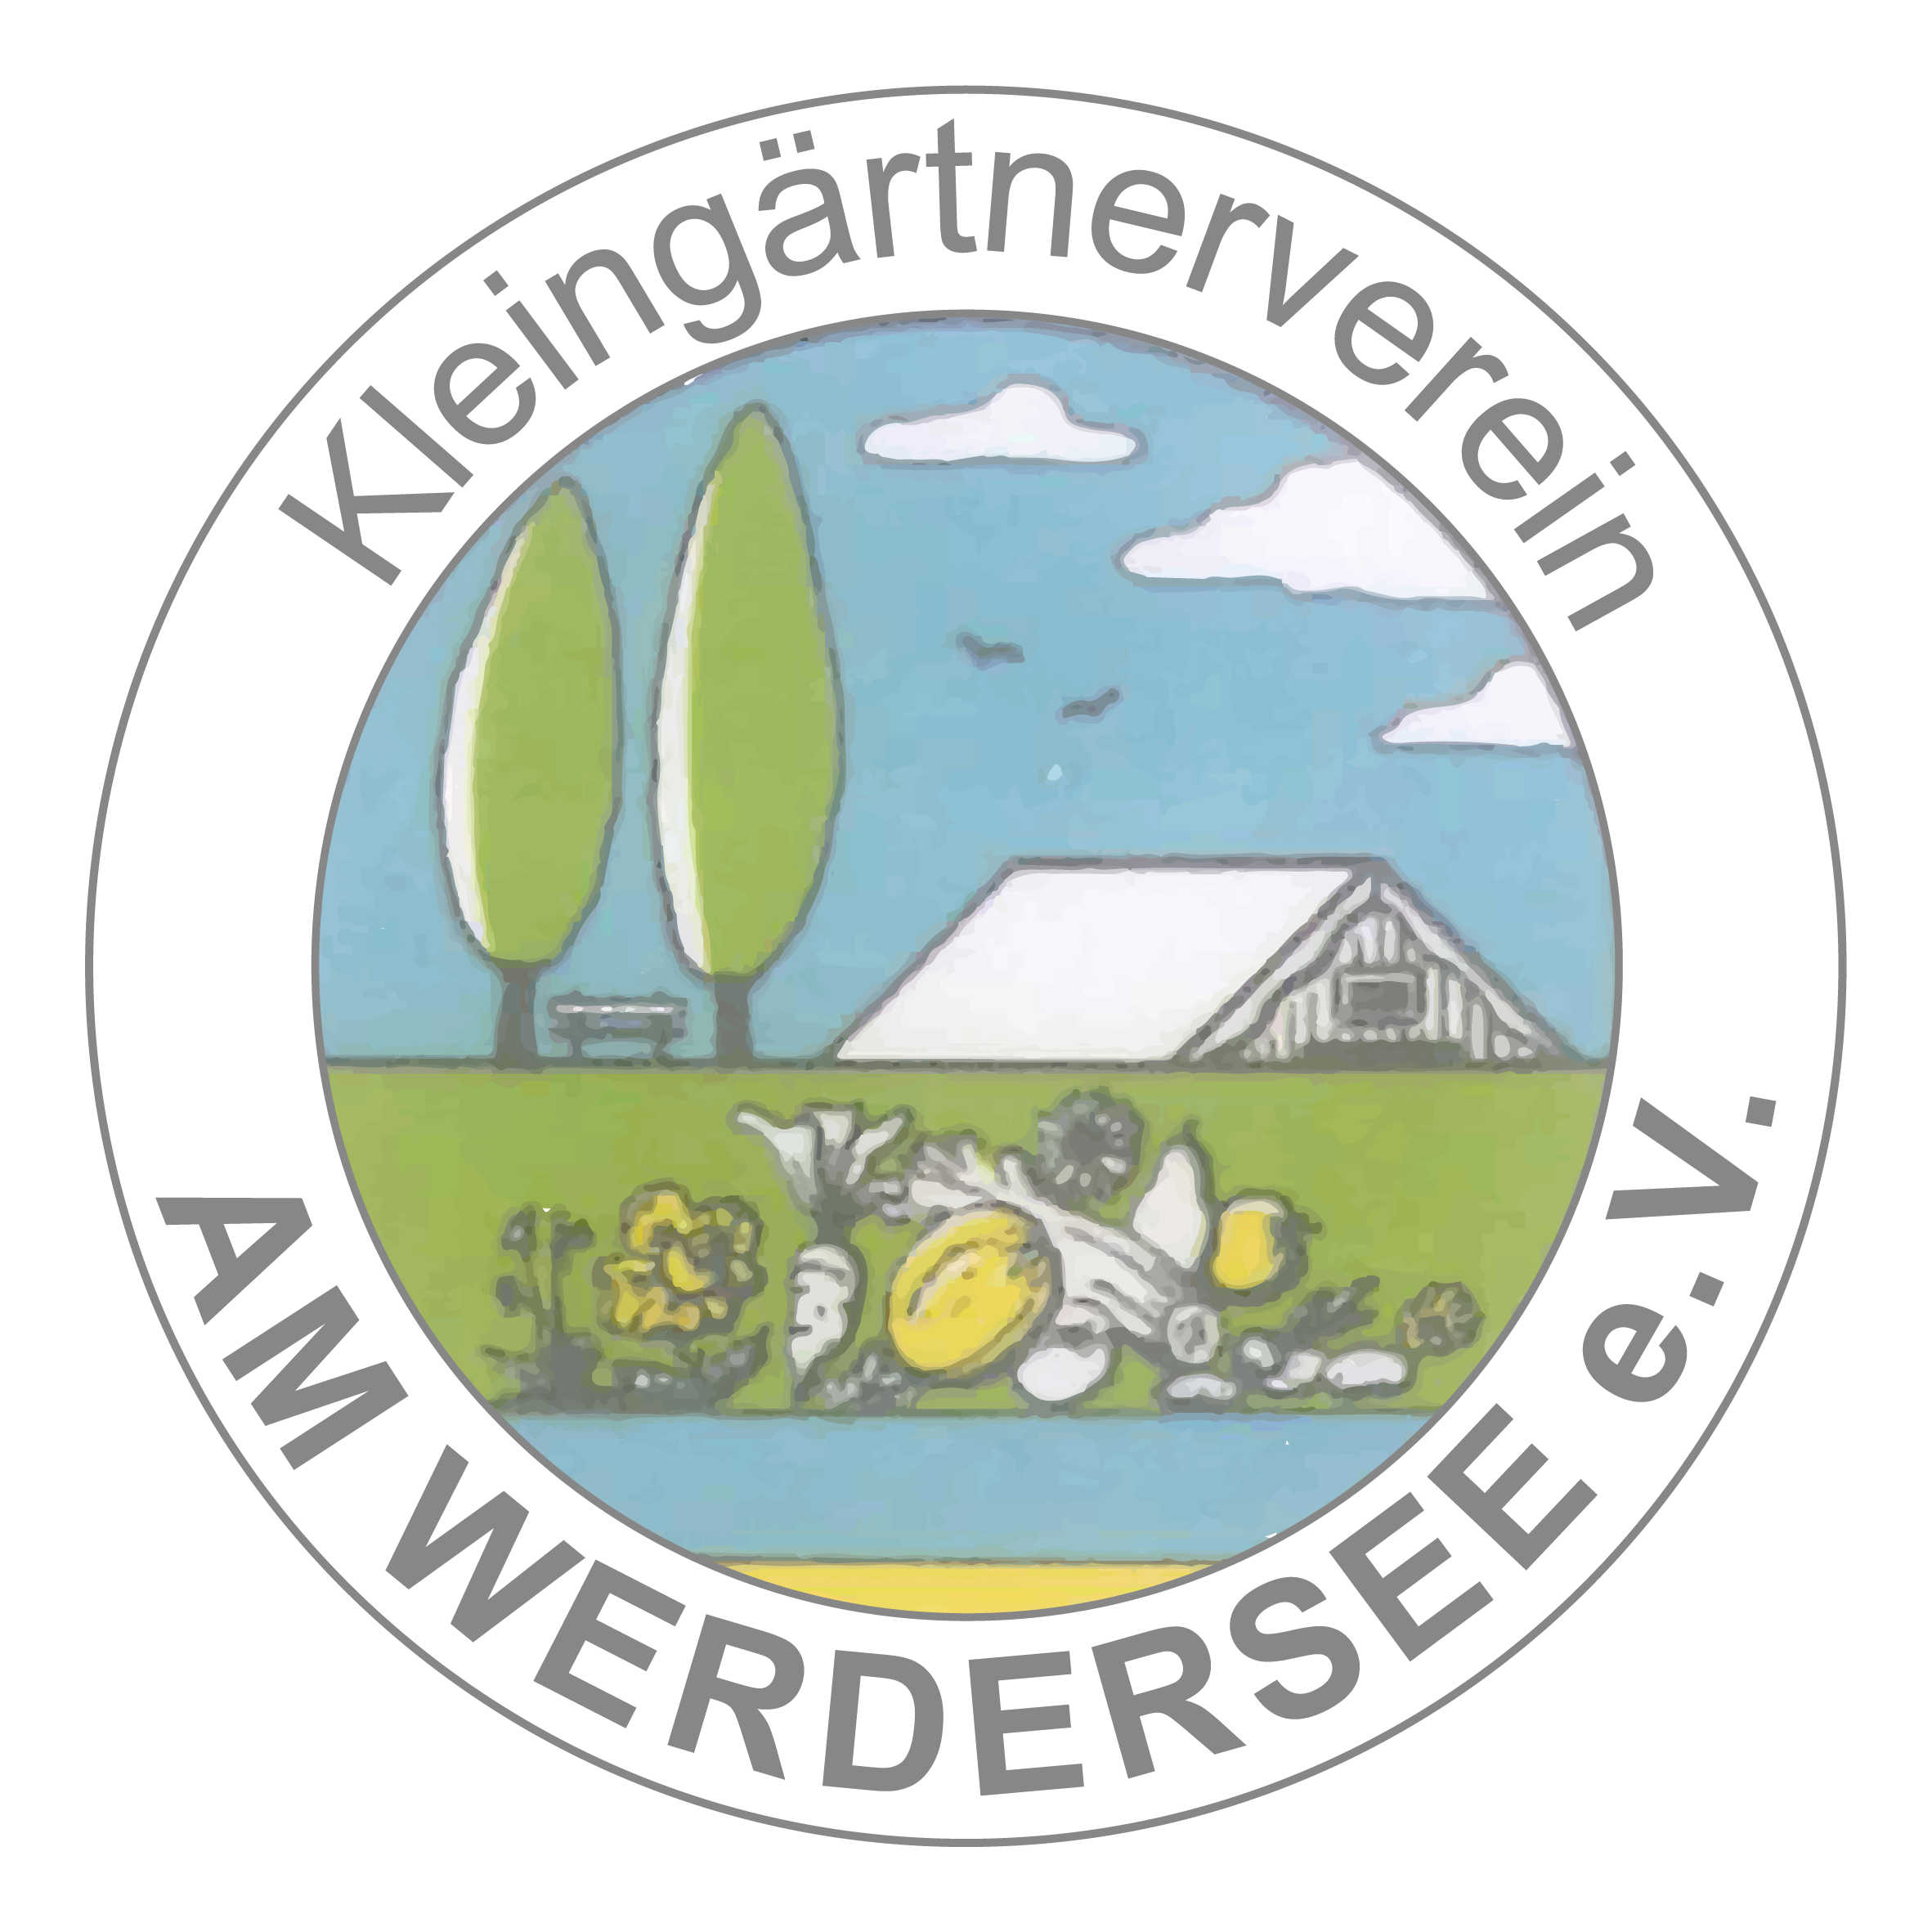 kgv-am-werdersee.de